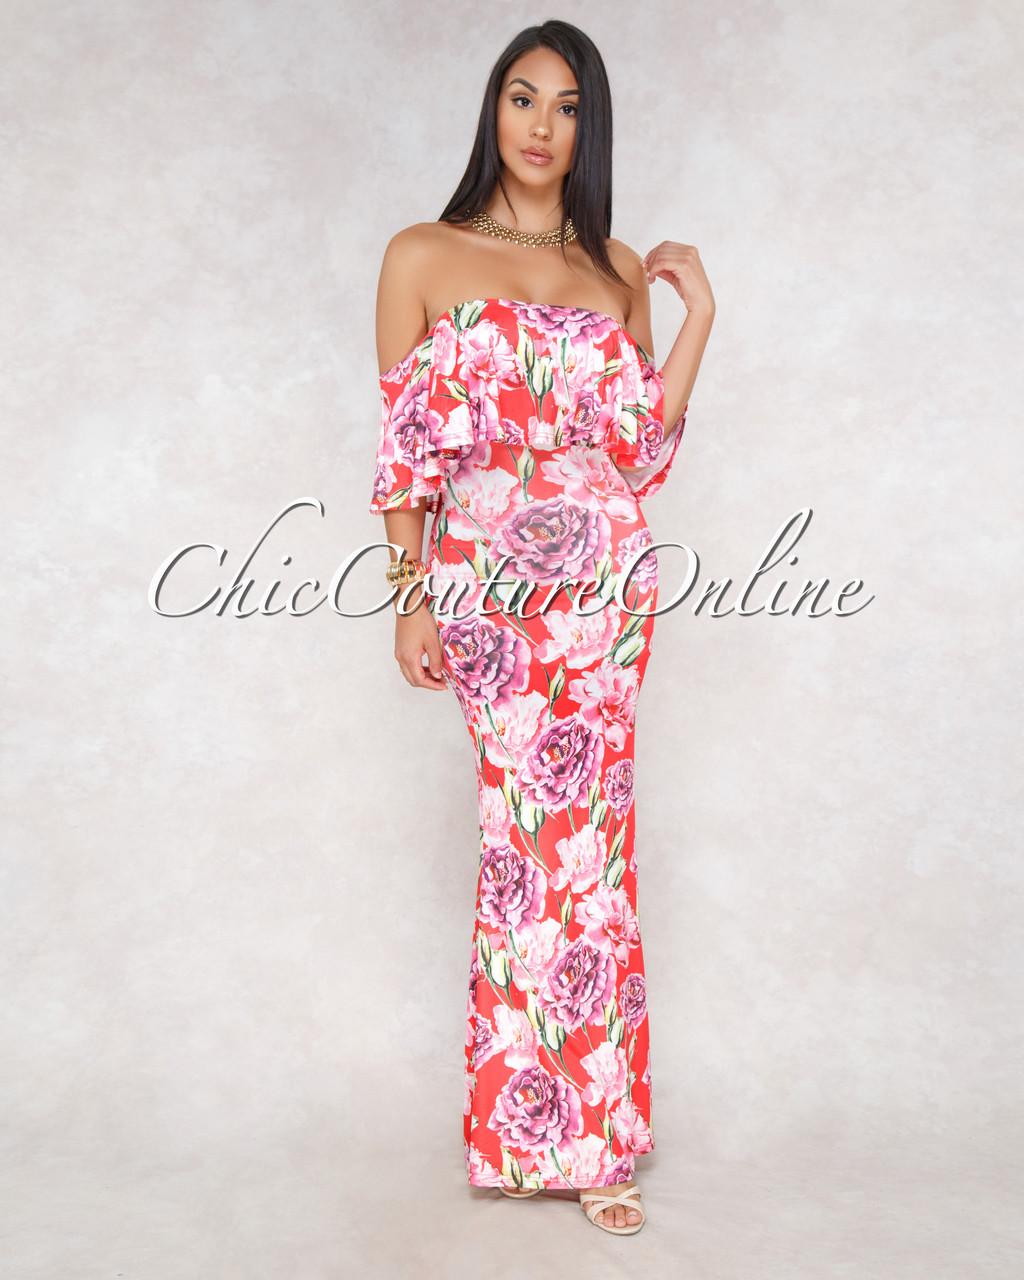 2e28df4293c8 ... Floral Print Off-The-Shoulder Maxi Dress. Price   60.00. Image 1